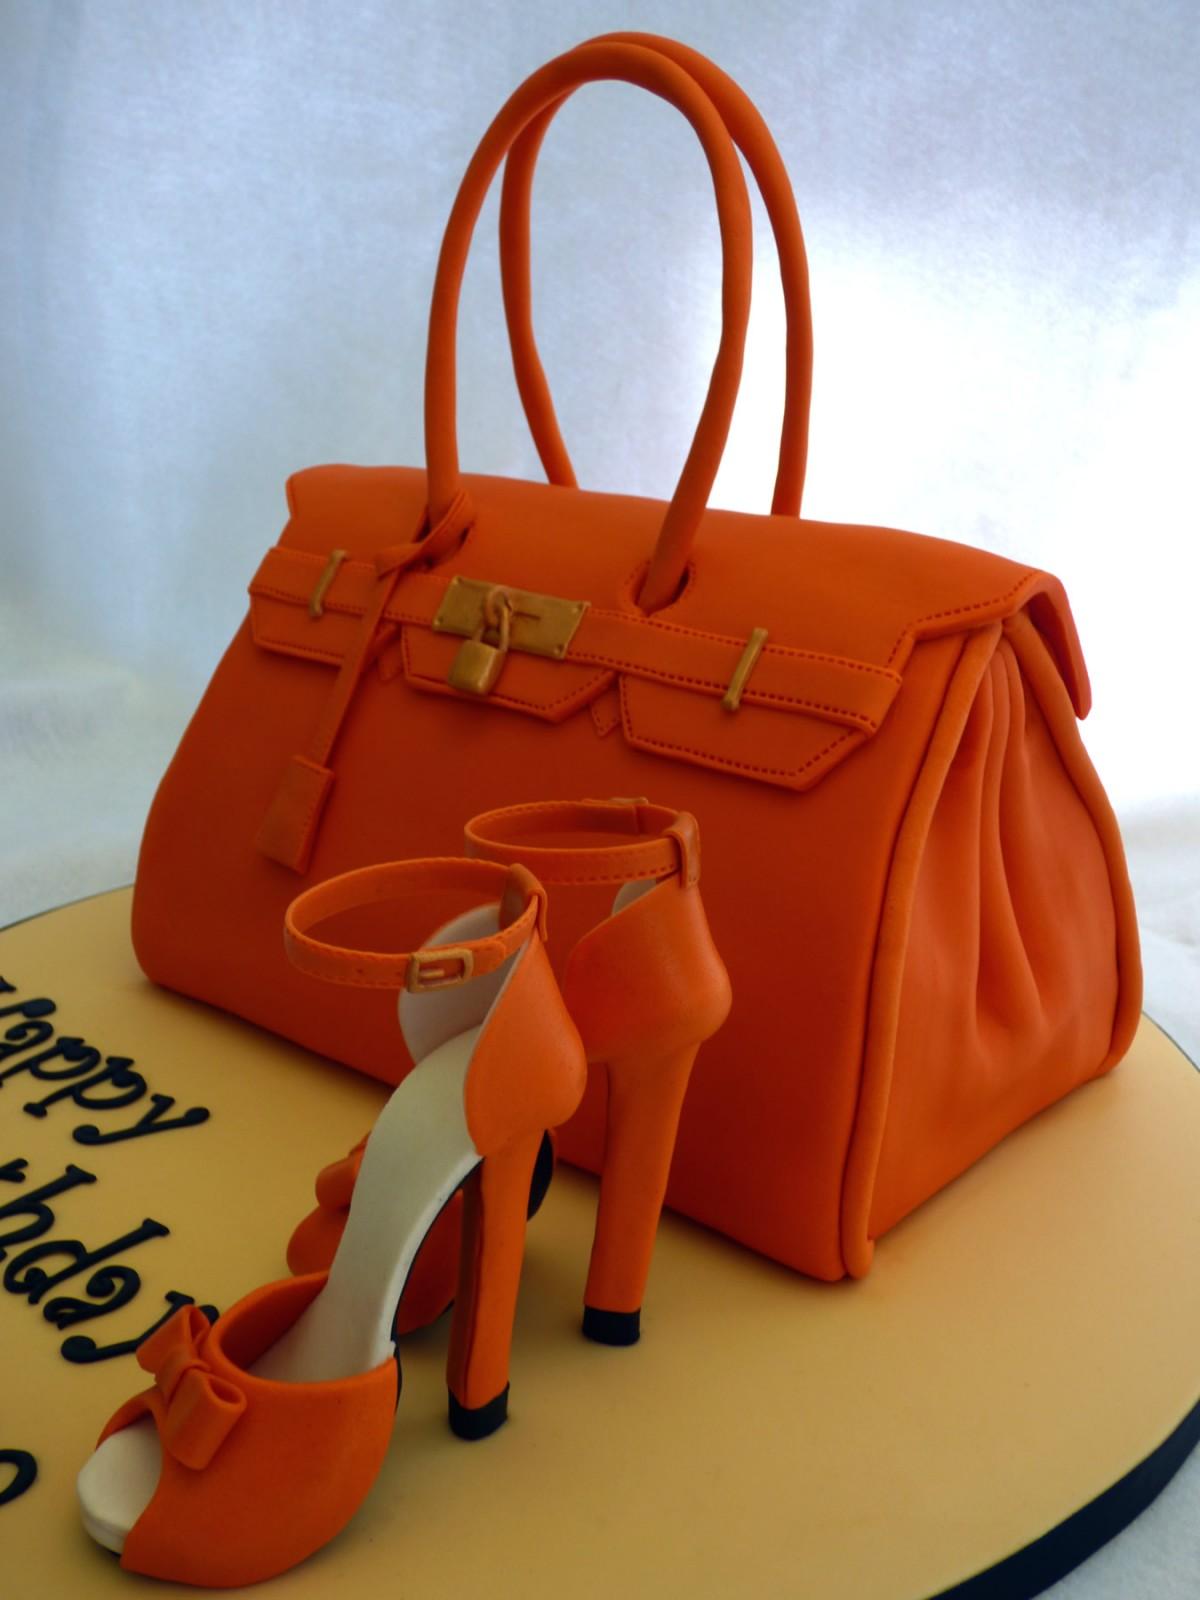 Handbag Design Birthday Cake : Orange Designer Handbag and Shoes Birthday Cake   Susie s ...